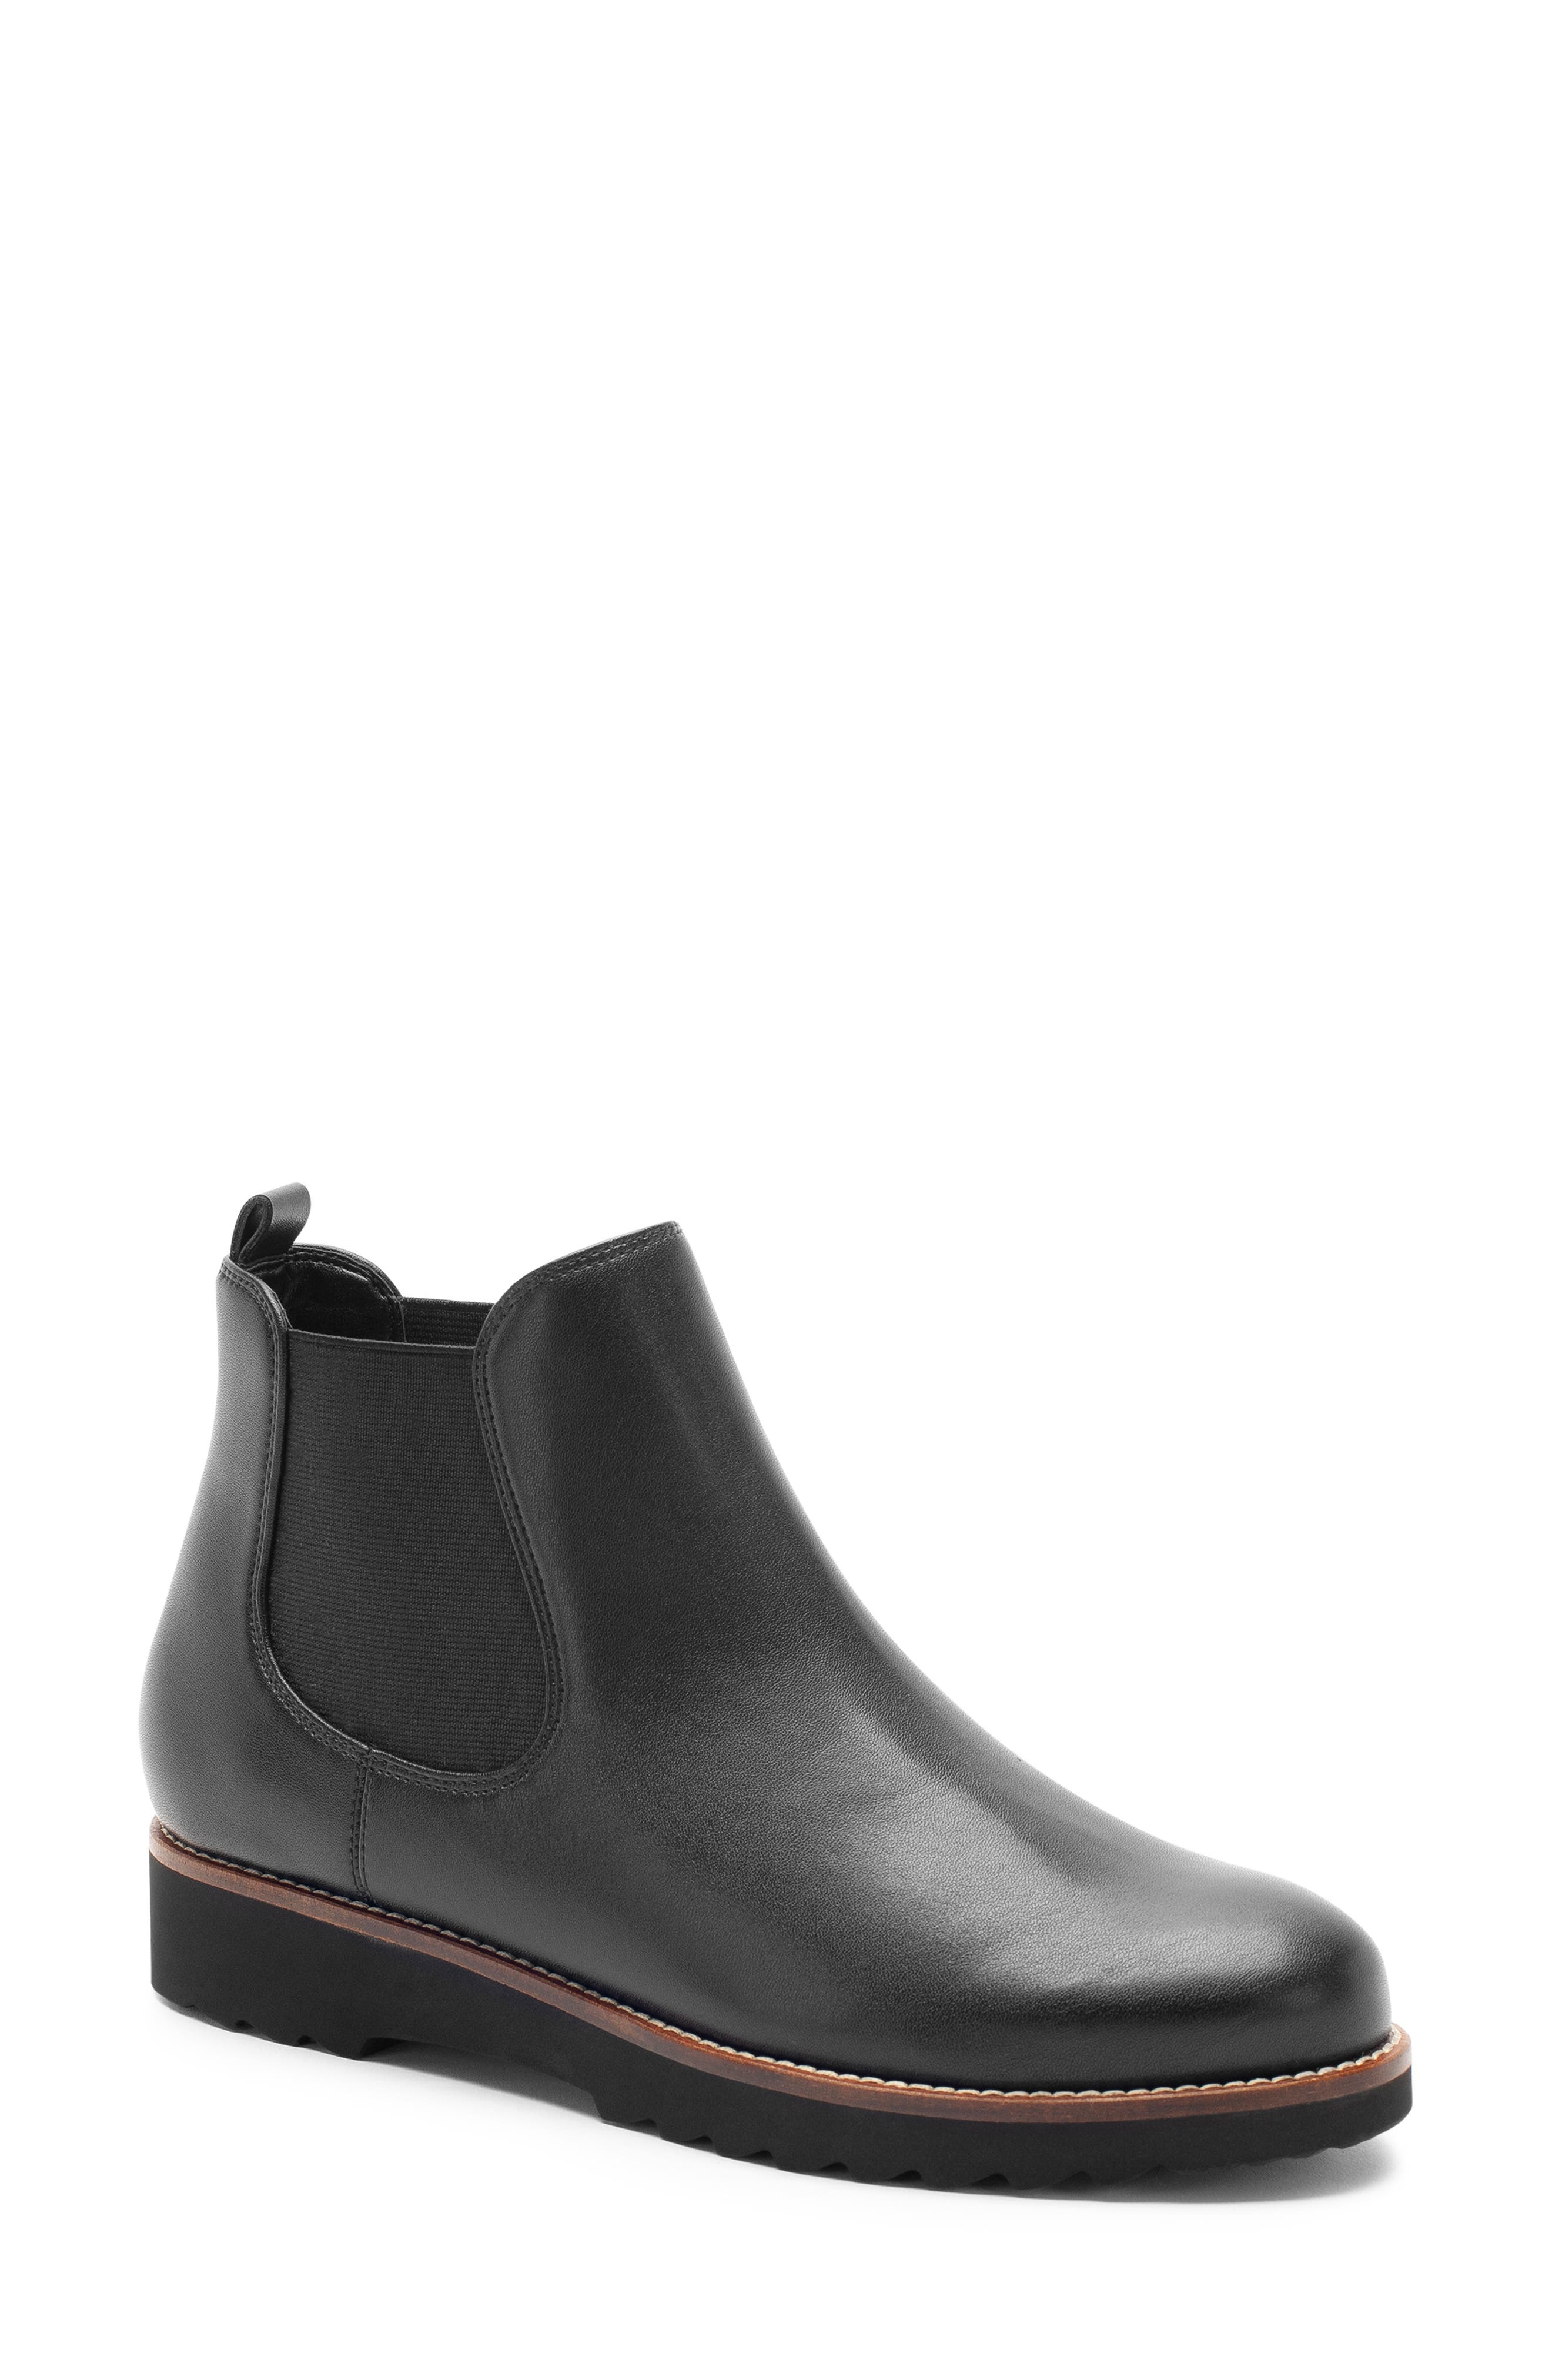 Roman Waterproof Bootie,                         Main,                         color, Black Leather